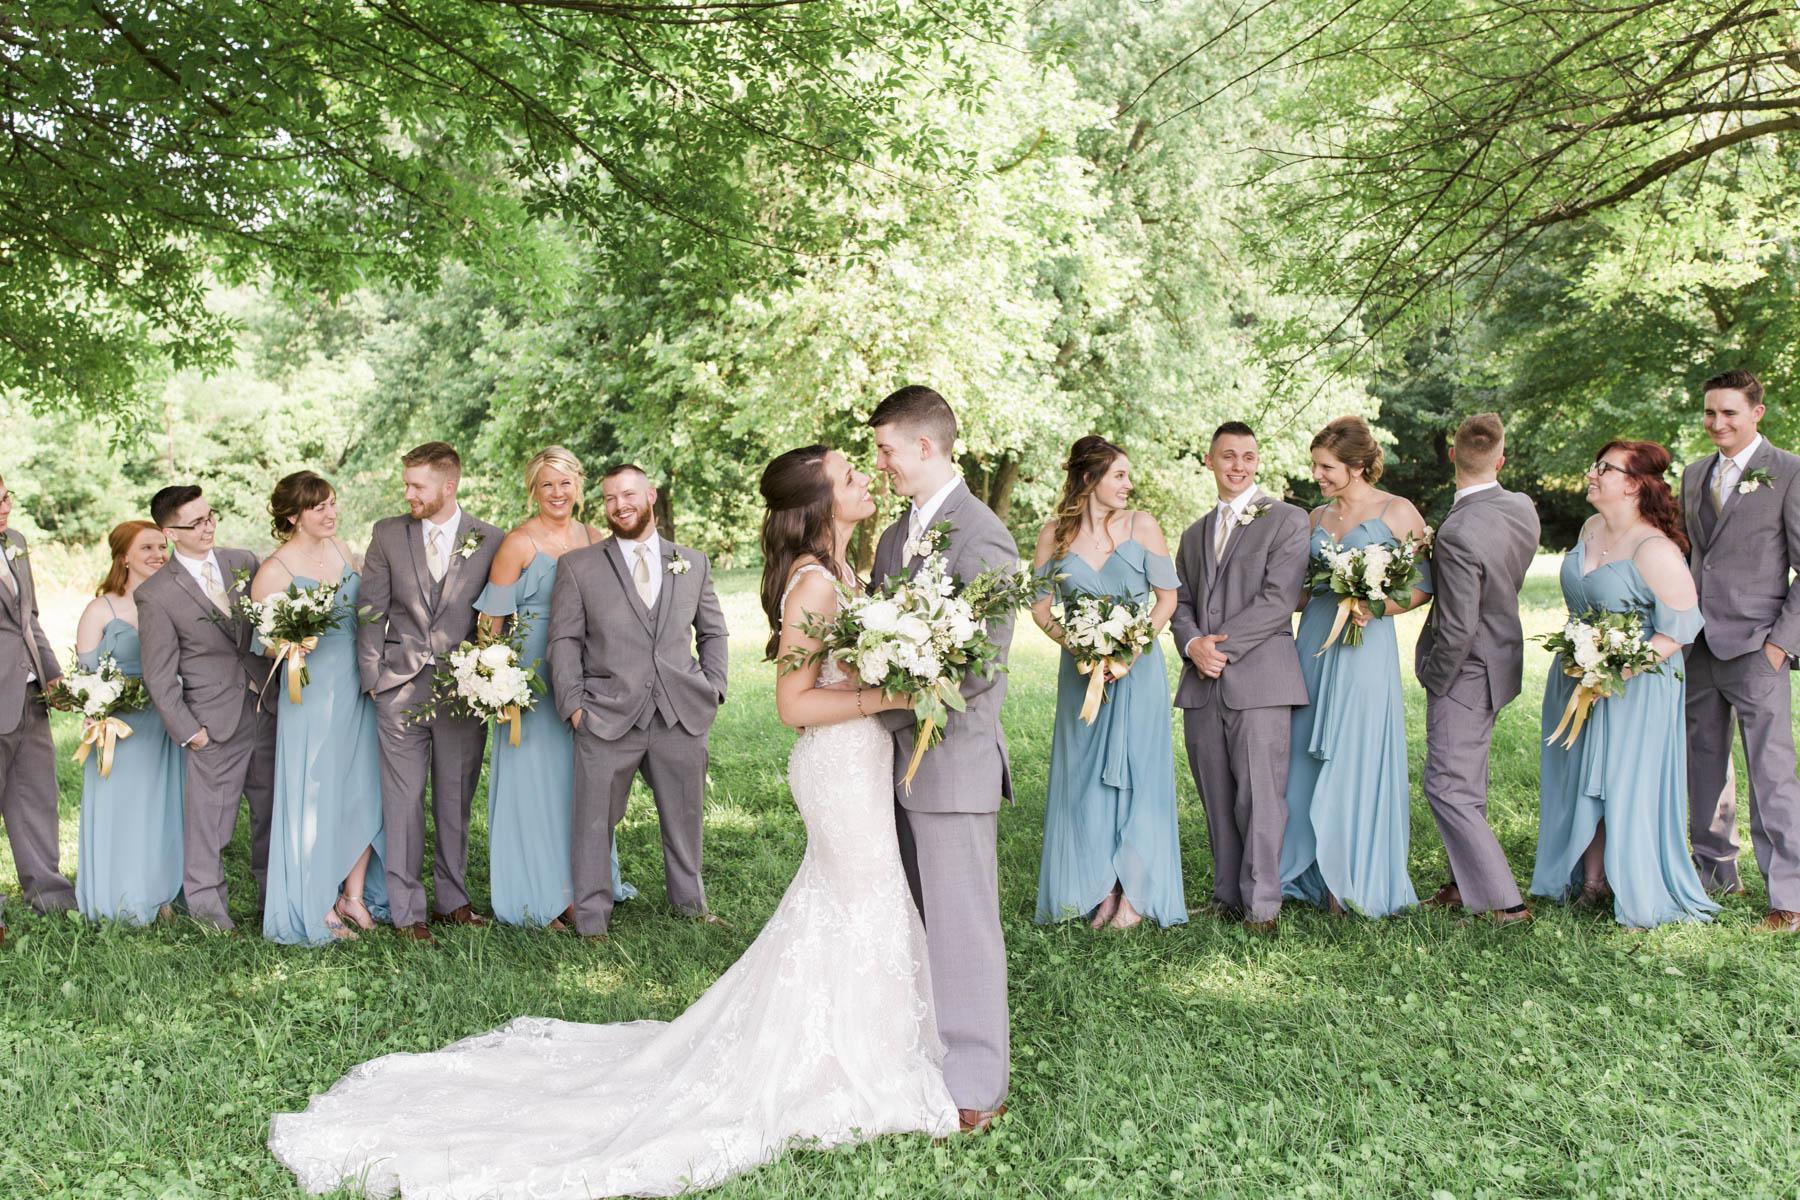 shotbychelsea_wedding_blog-22.jpg